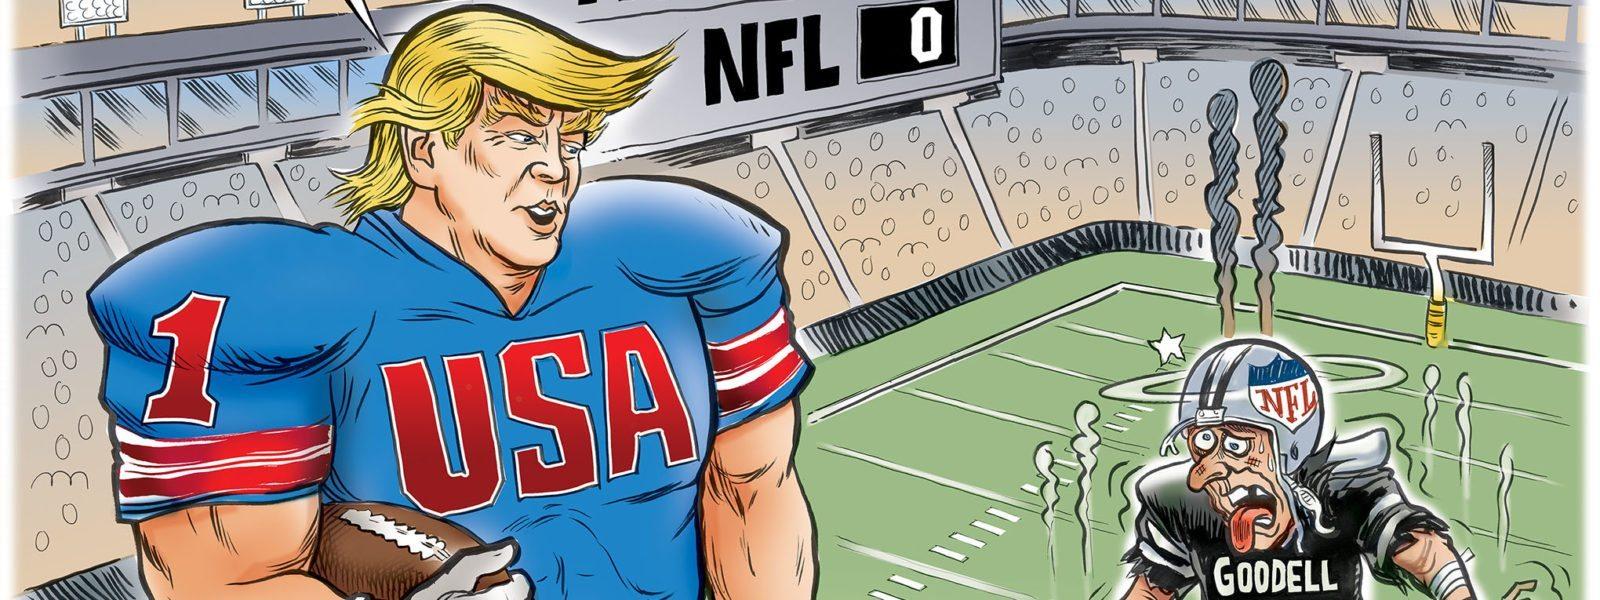 The NFL Fumbles Again